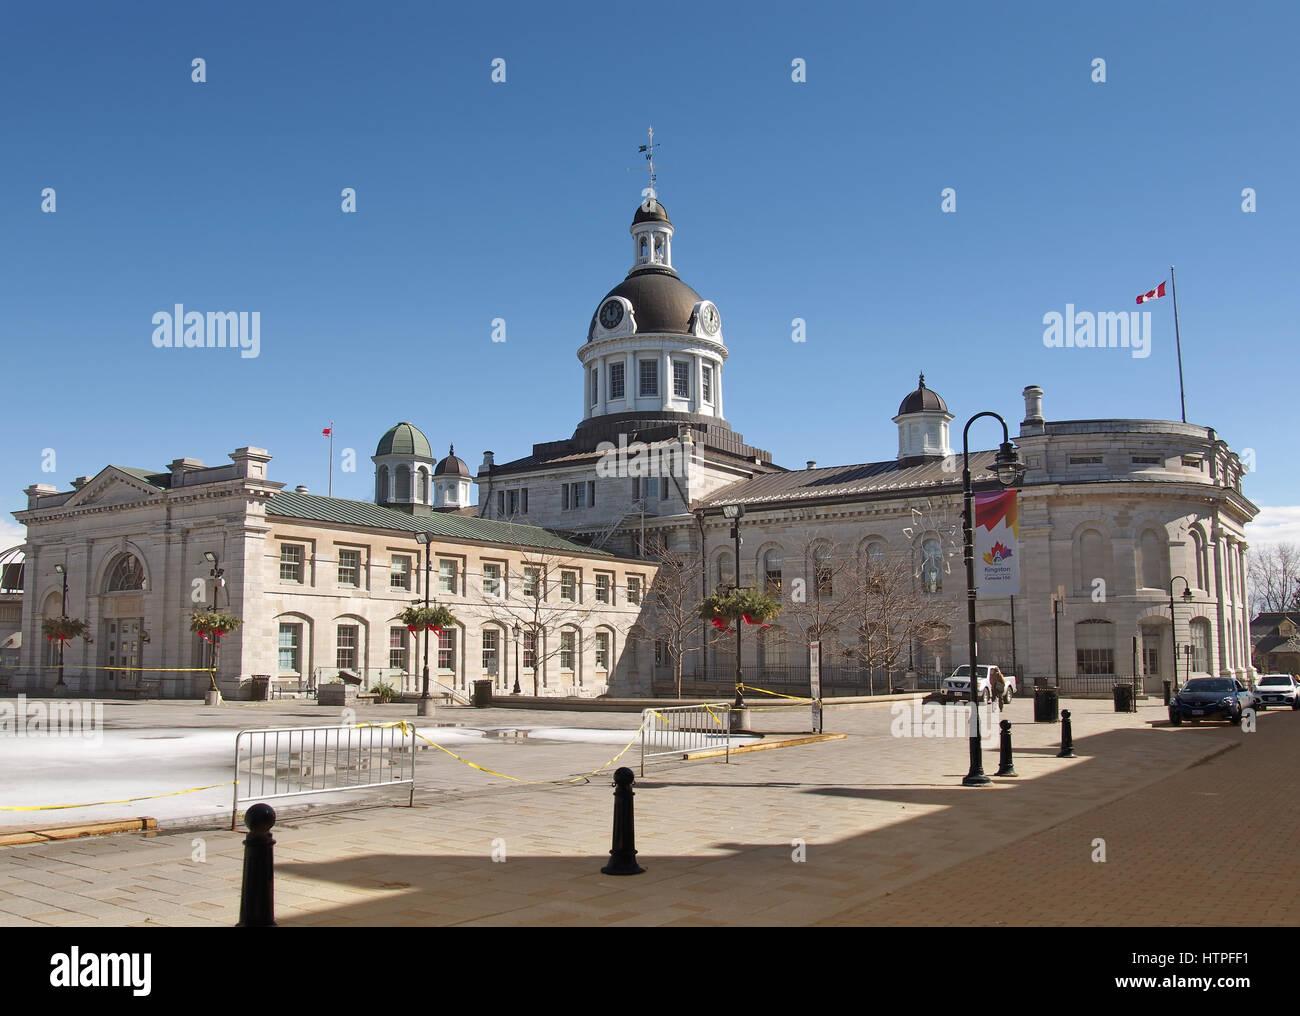 Kingston, Ontario, Canada, March 8,2017. Kingston, Ontario, Canada, March 8,2017. View of the Kingston City Hall, - Stock Image